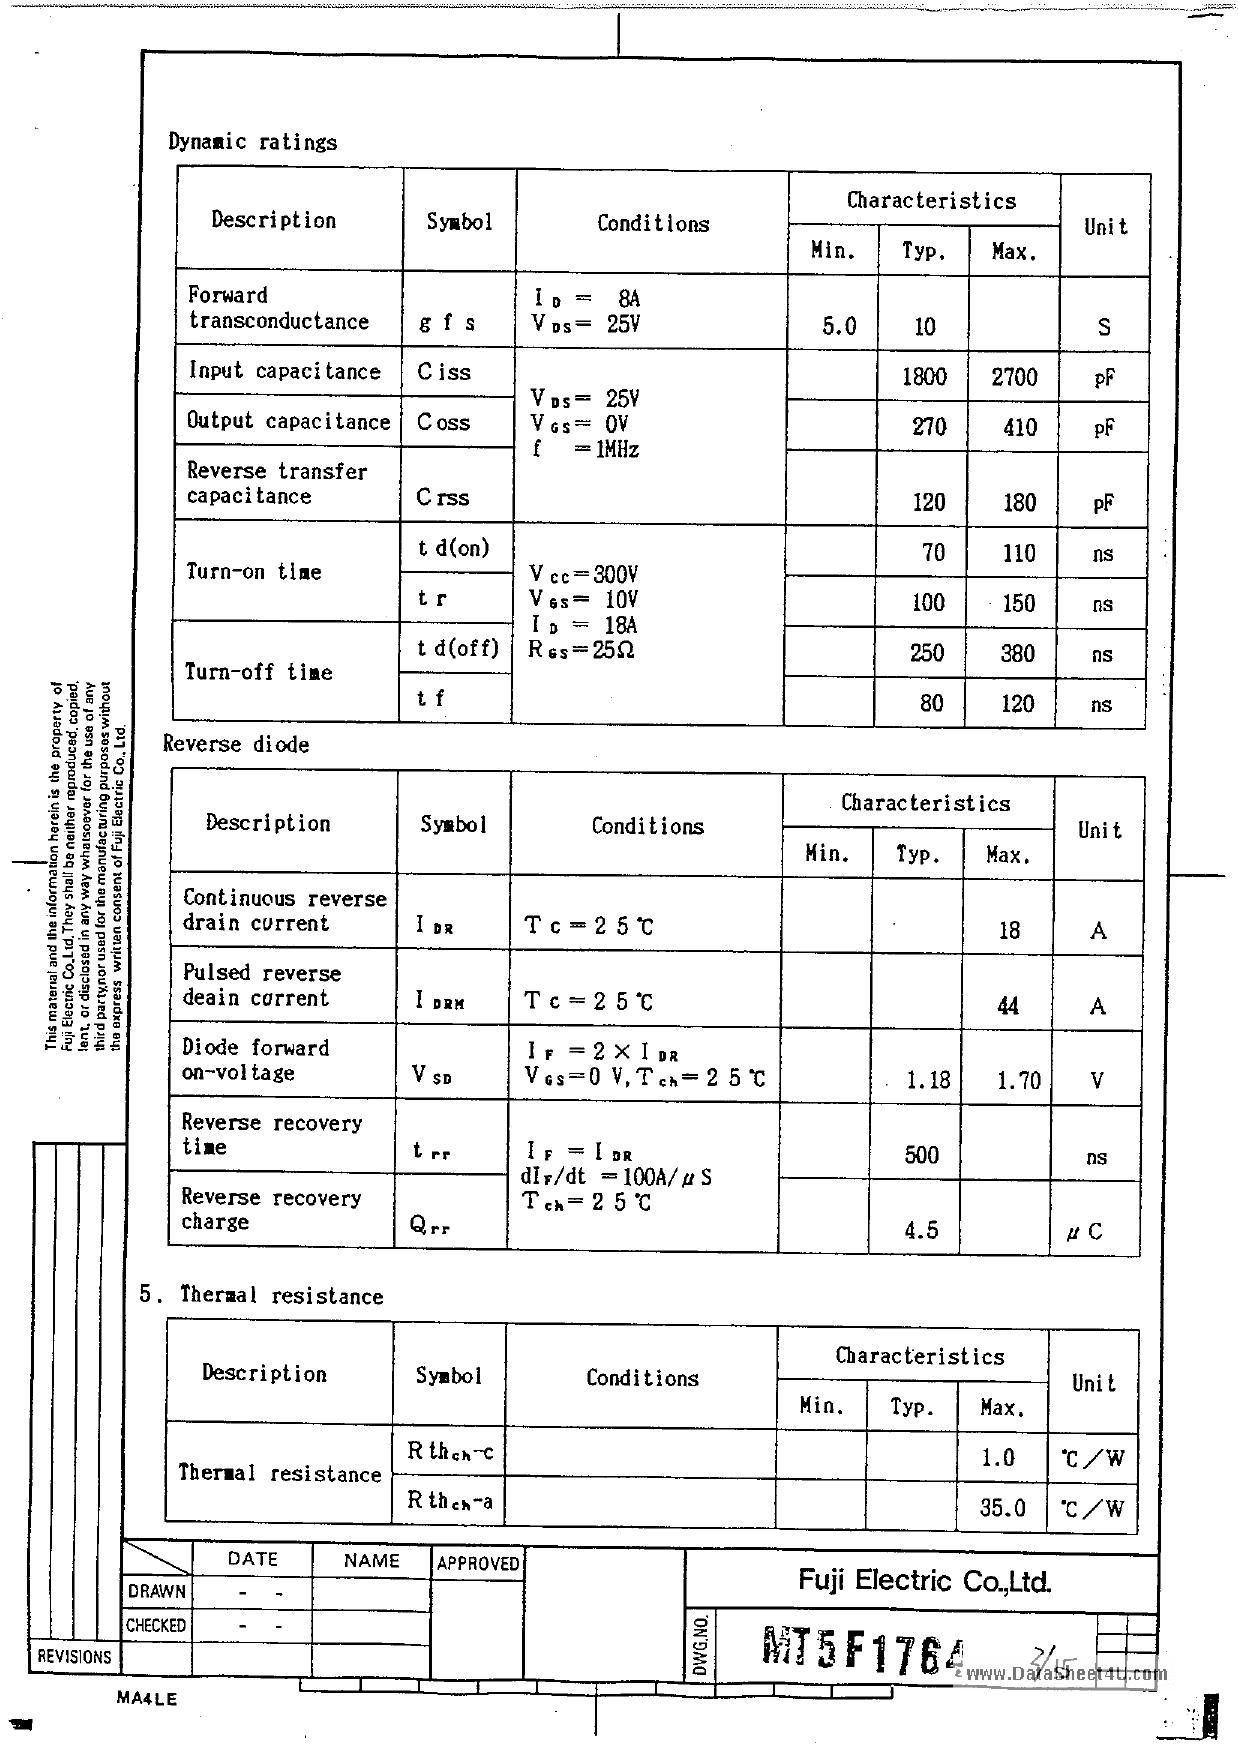 K1018 Даташит, Описание, Даташиты